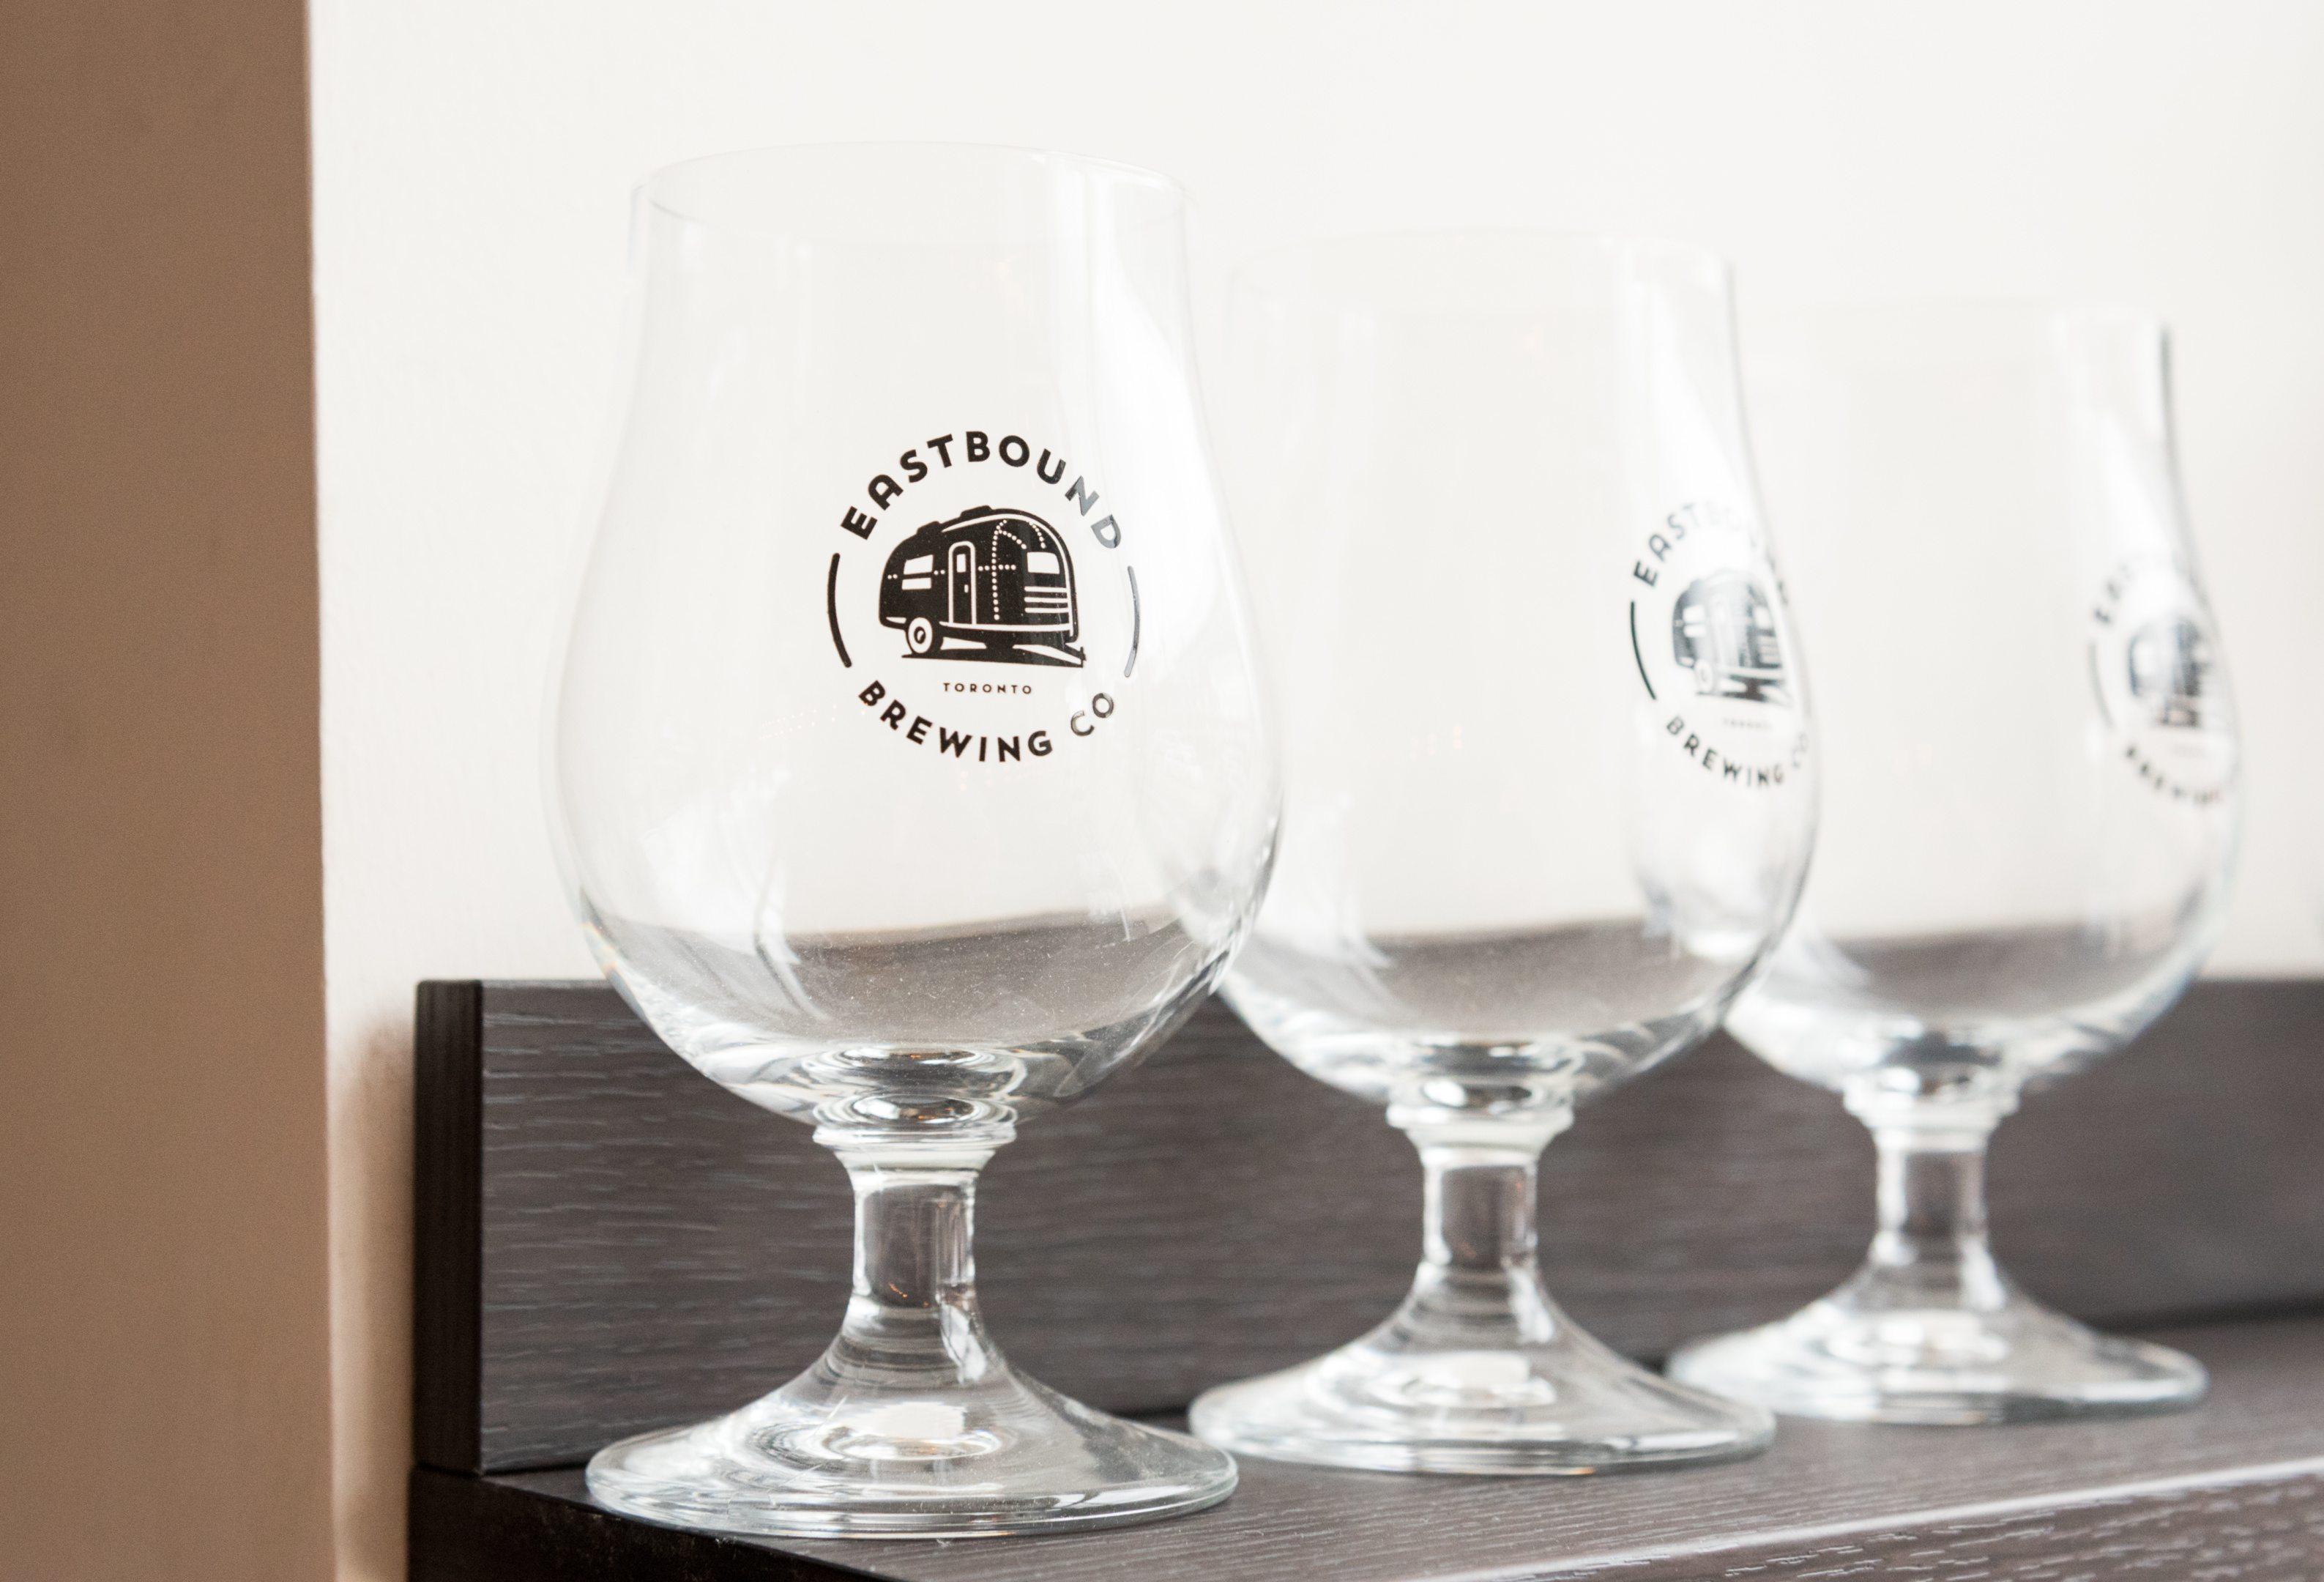 toronto-restaurants-breweries-eastbound-brewing-co-leslieville-beer-glasses